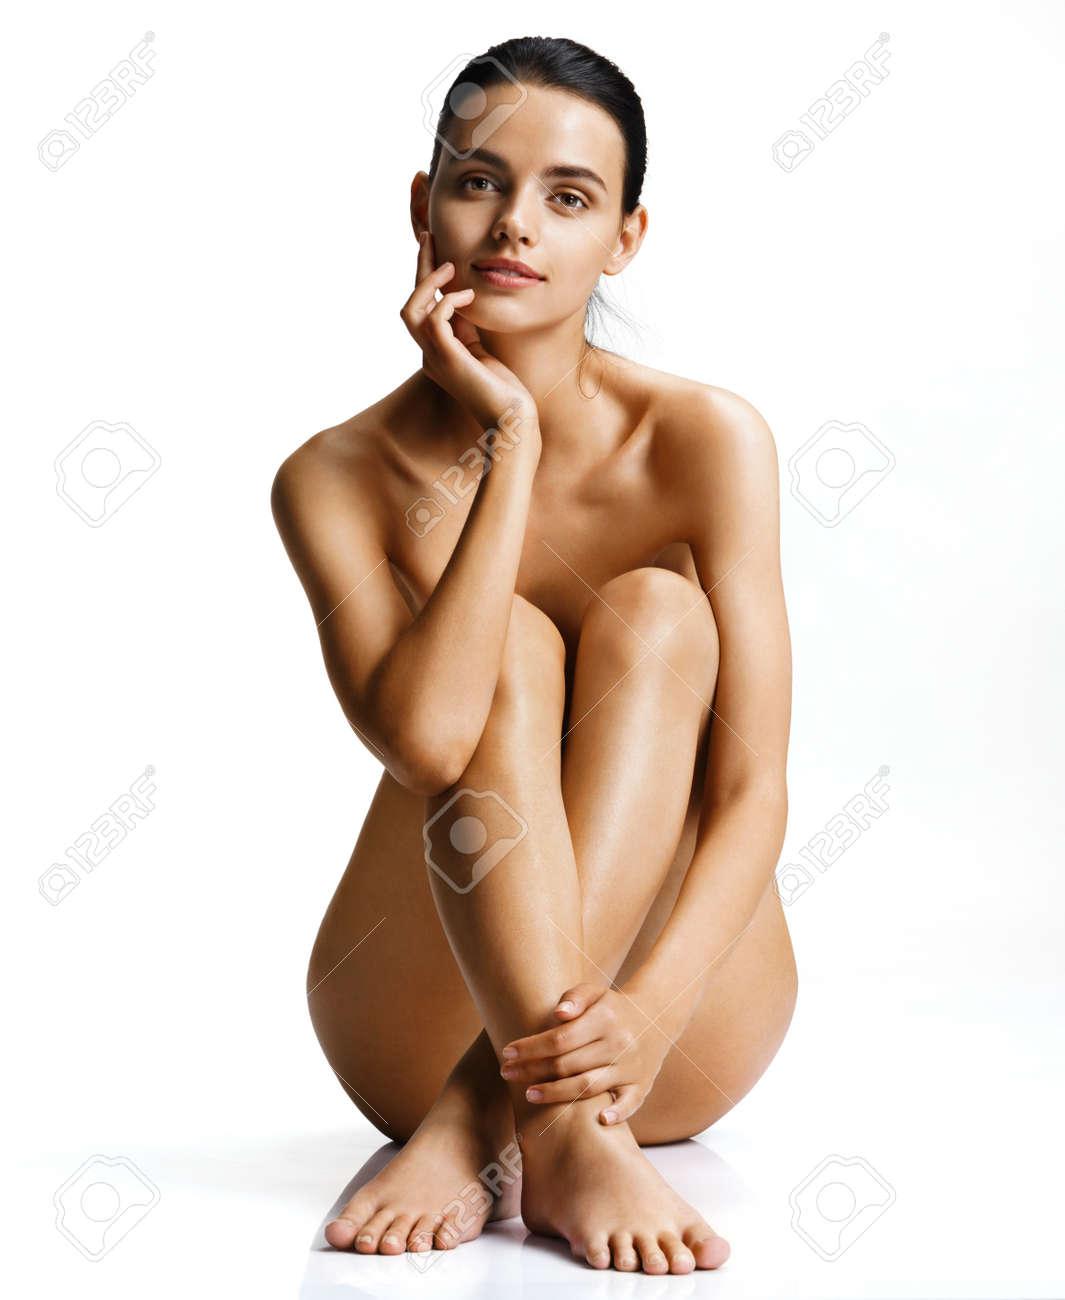 Booty hardcore porn pics and photos